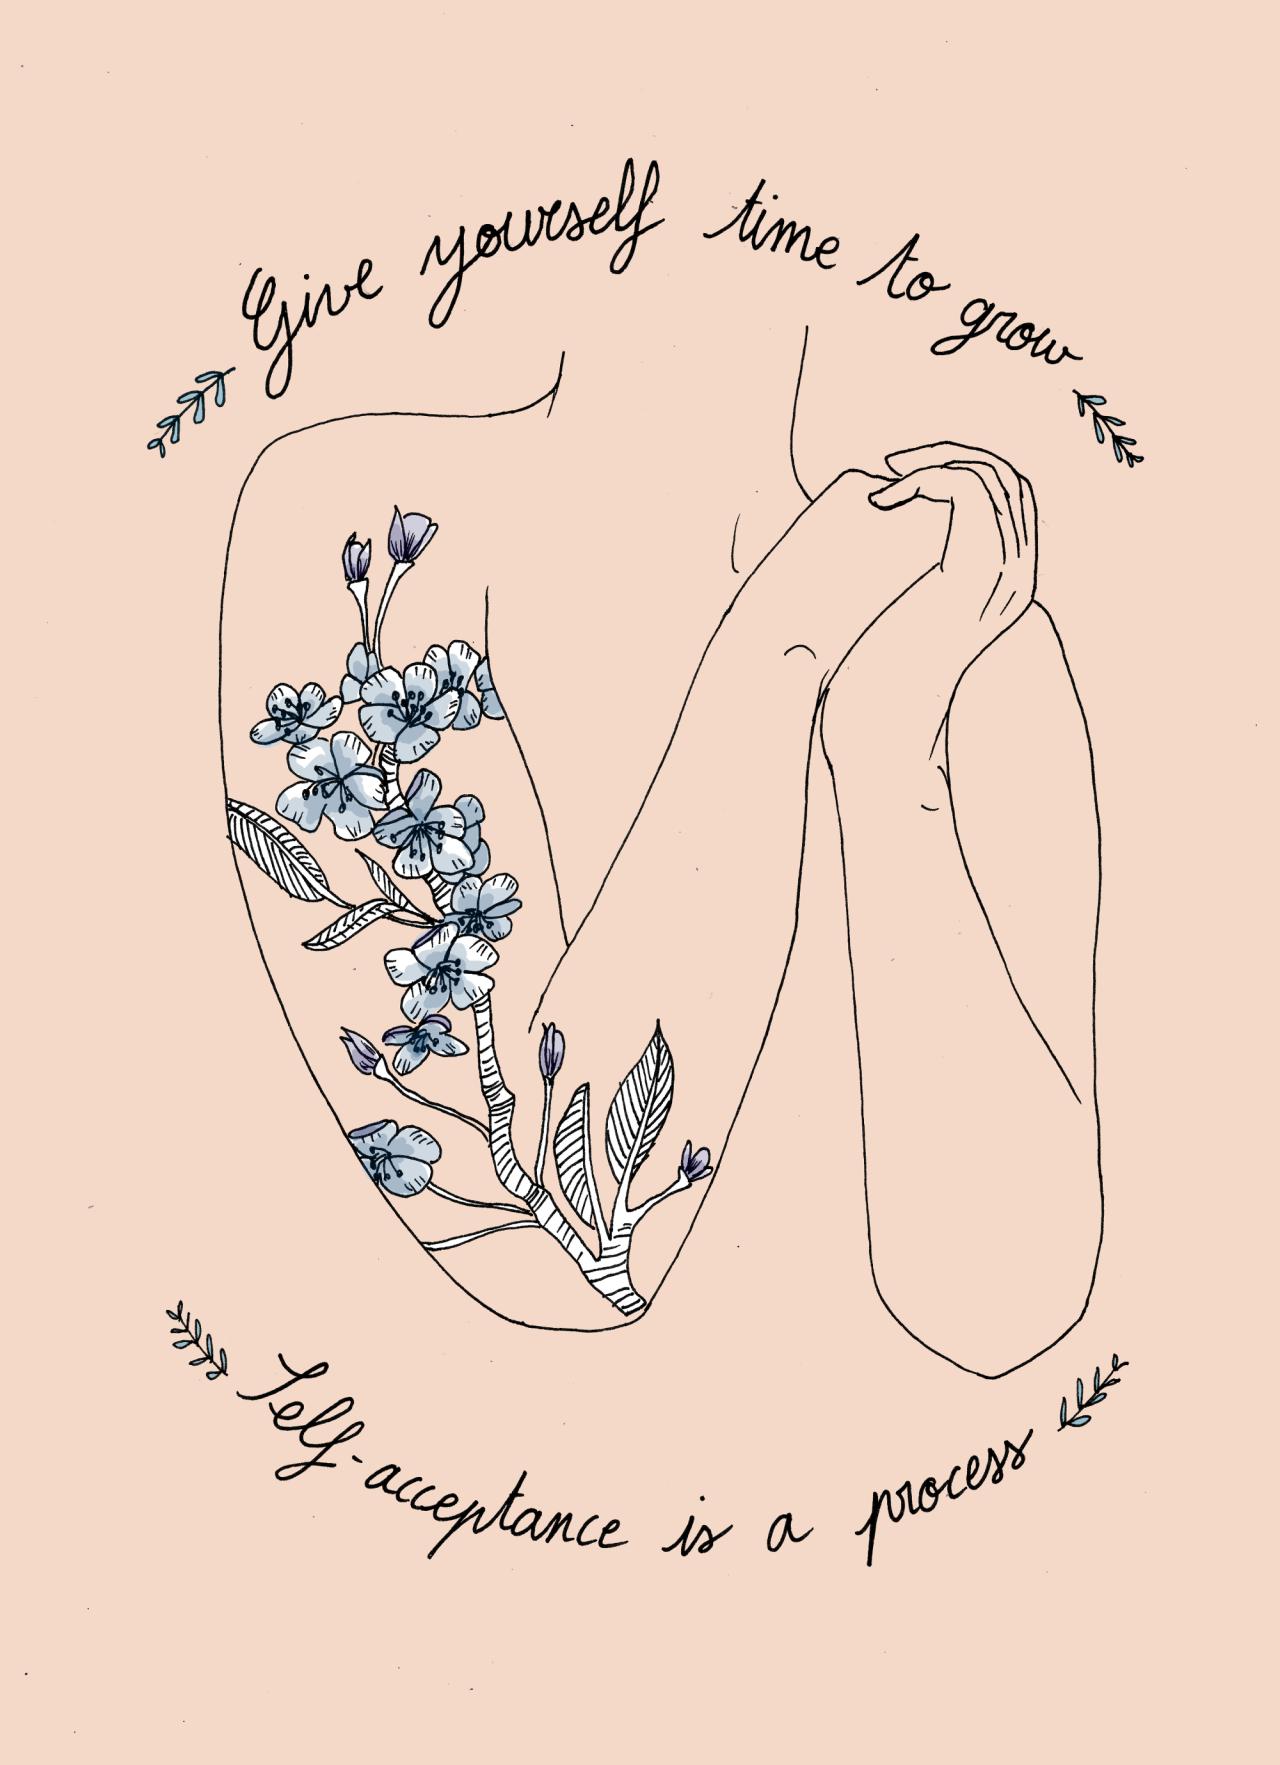 Aranzadrive Tumblr Pinterest Frases Citações And Amor Proprio